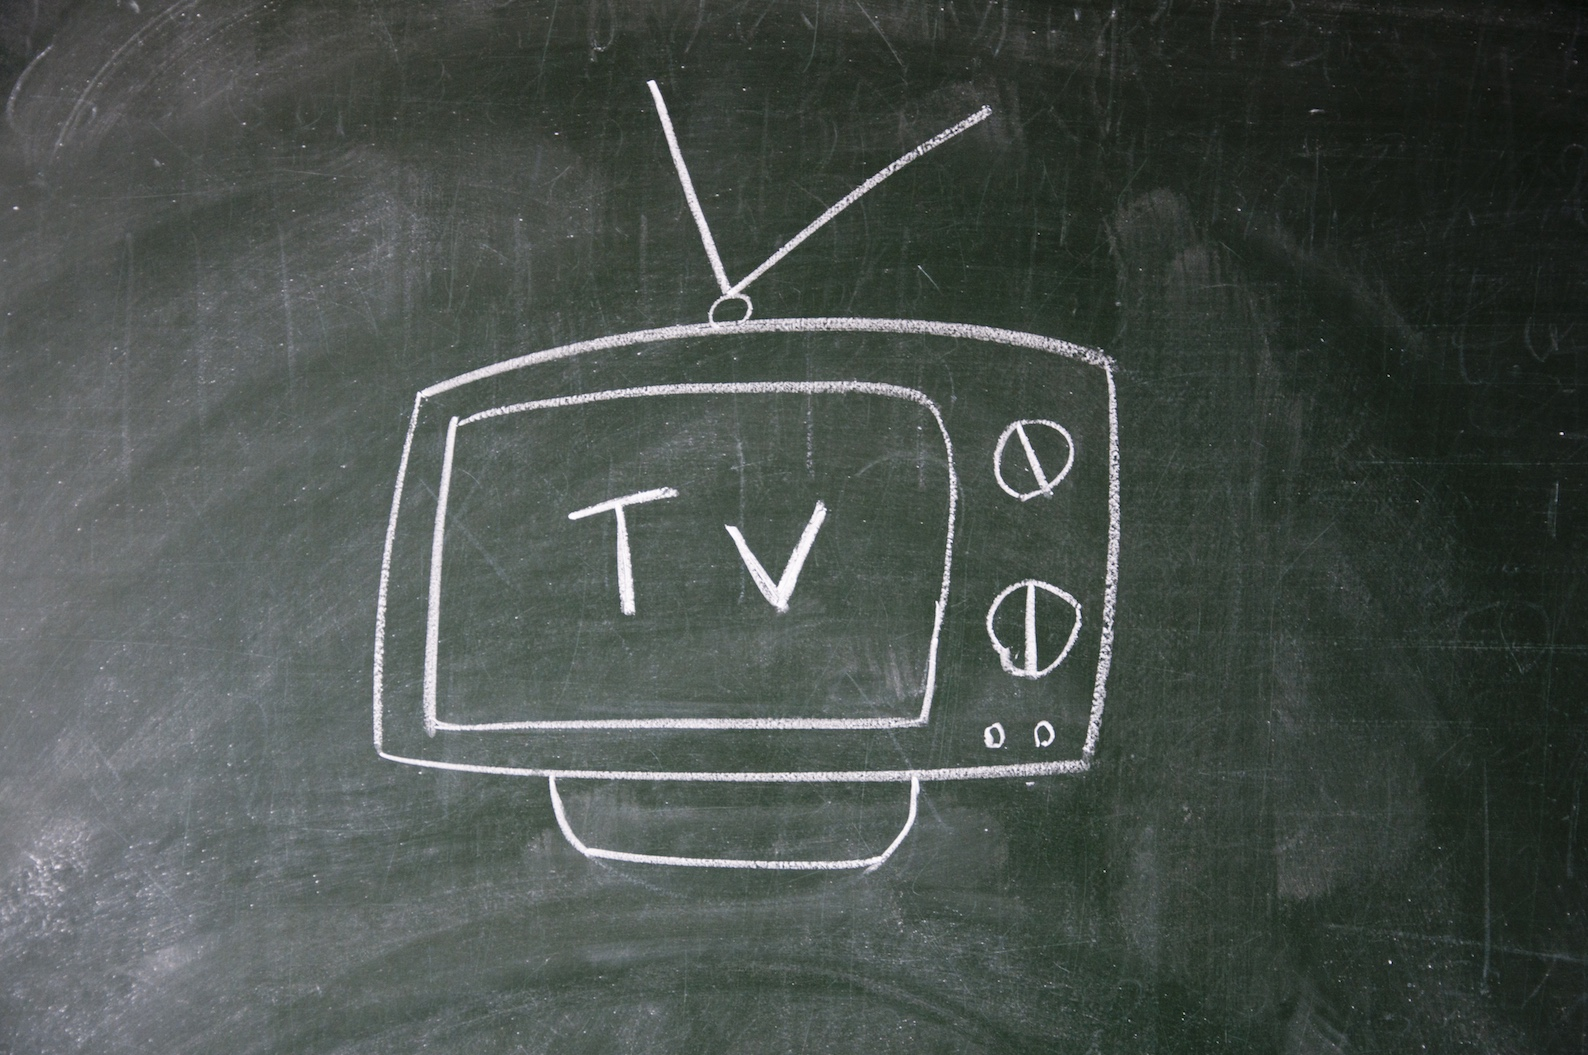 TV sign